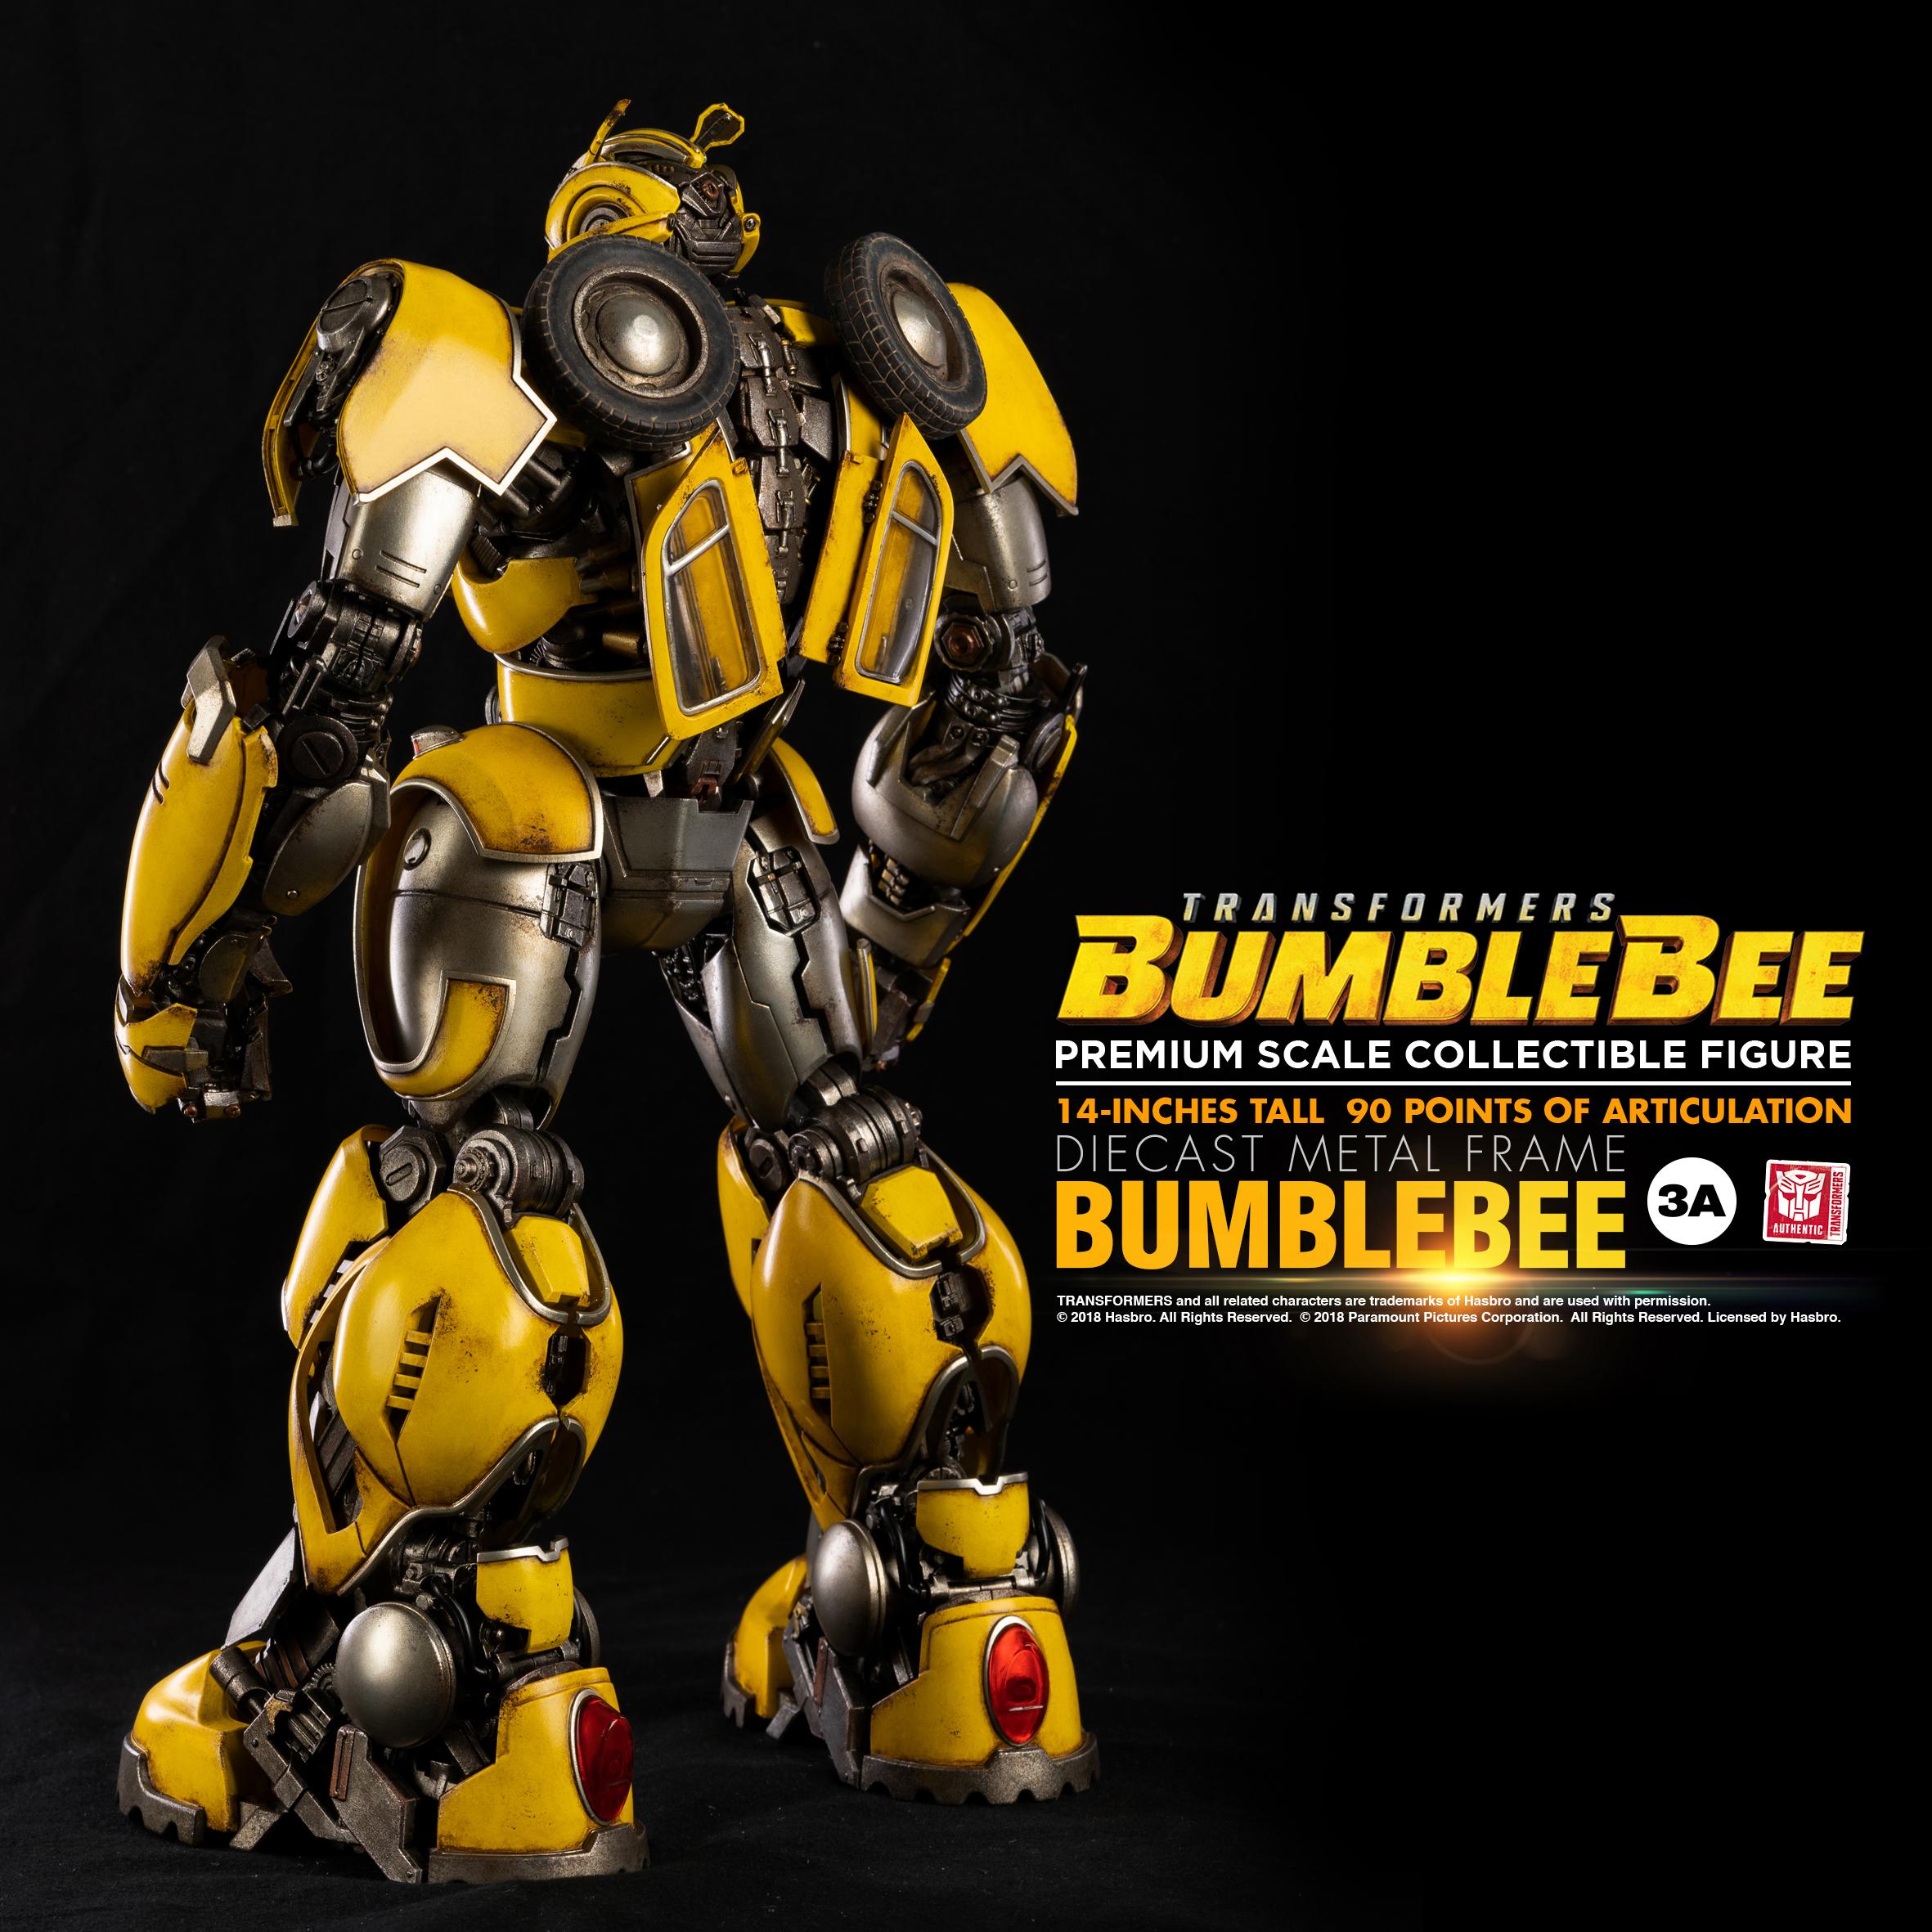 Bumblebee_ENG_PM_SQUARE_012.jpg